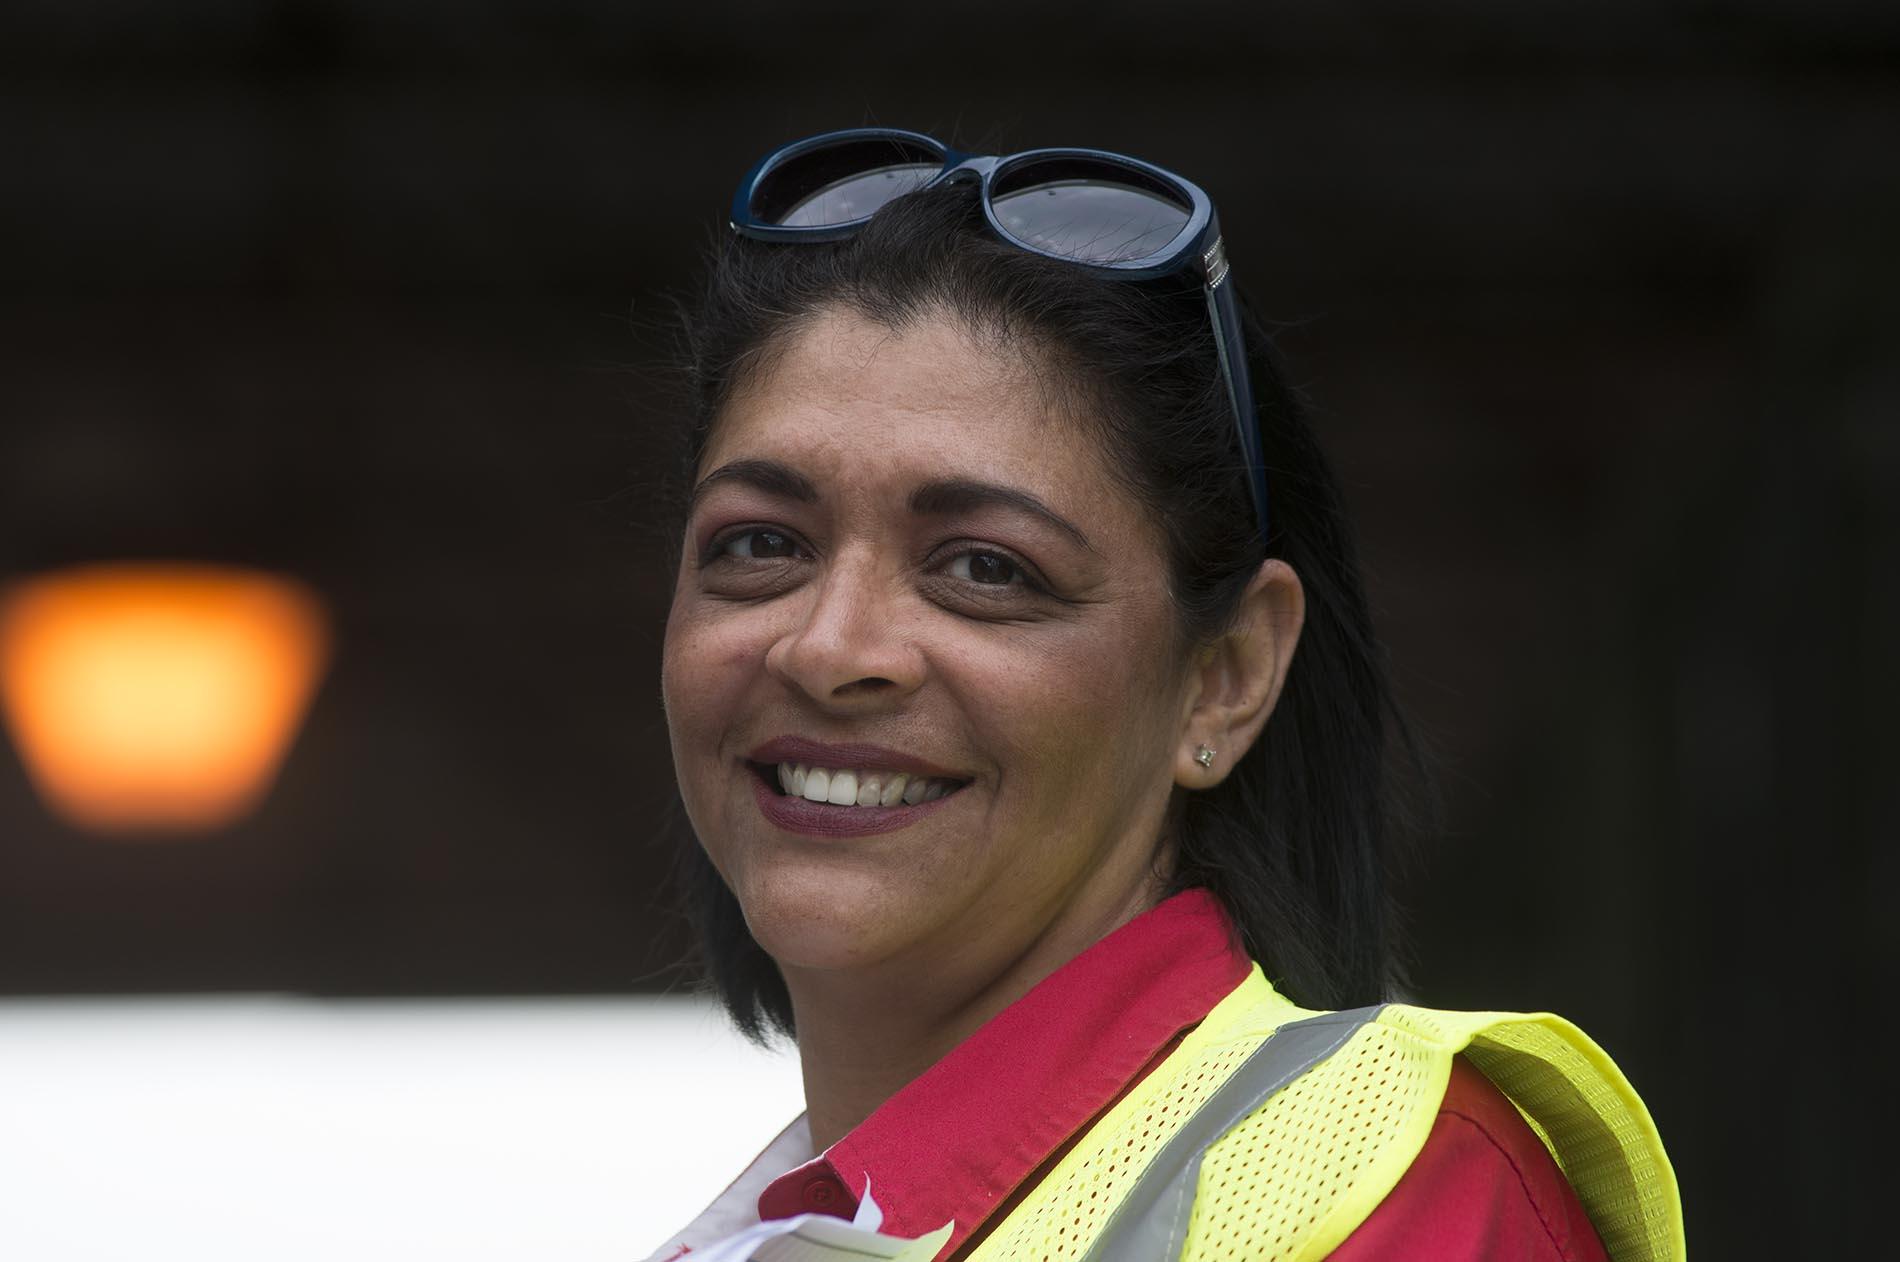 Female safety vest